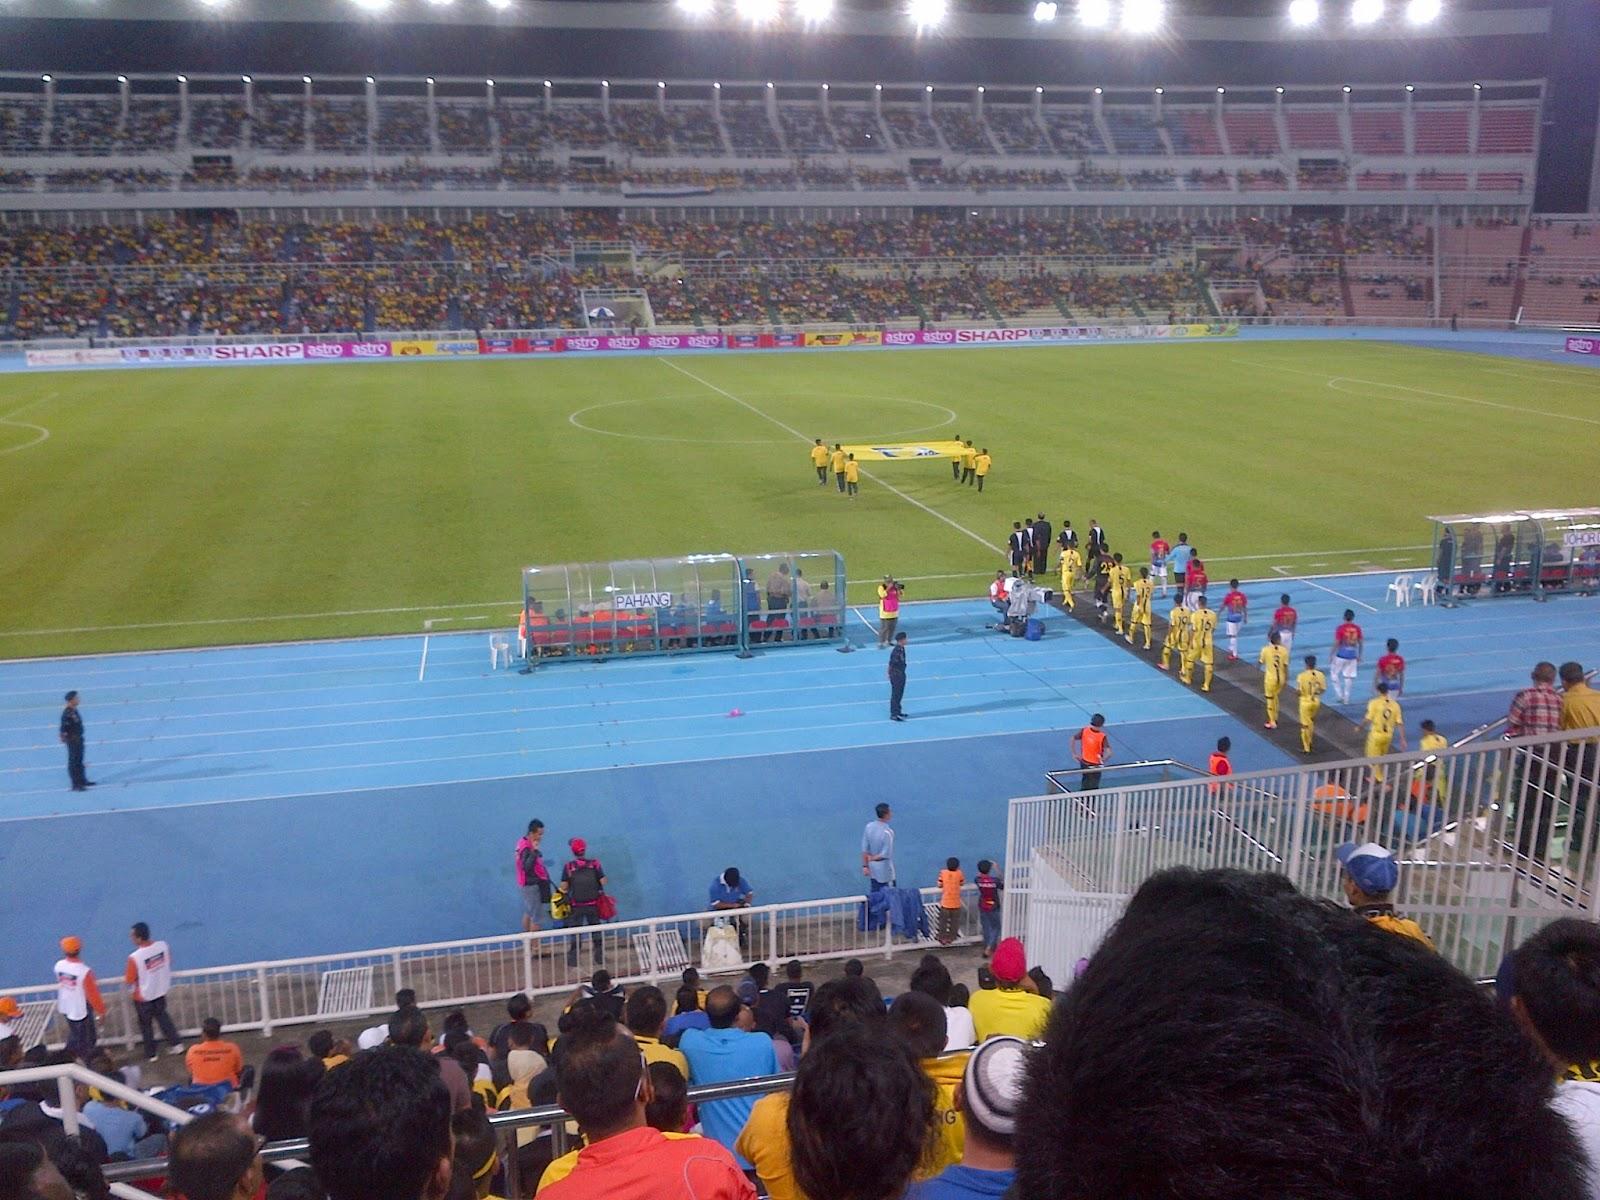 http://4.bp.blogspot.com/-F_pS6XGV_yM/UO57aUC8VXI/AAAAAAAADOk/H2SB7-vx814/s1600/Liga+Super+-+Pahang+vs+Johor+Darul+Takzim+FC2.jpg